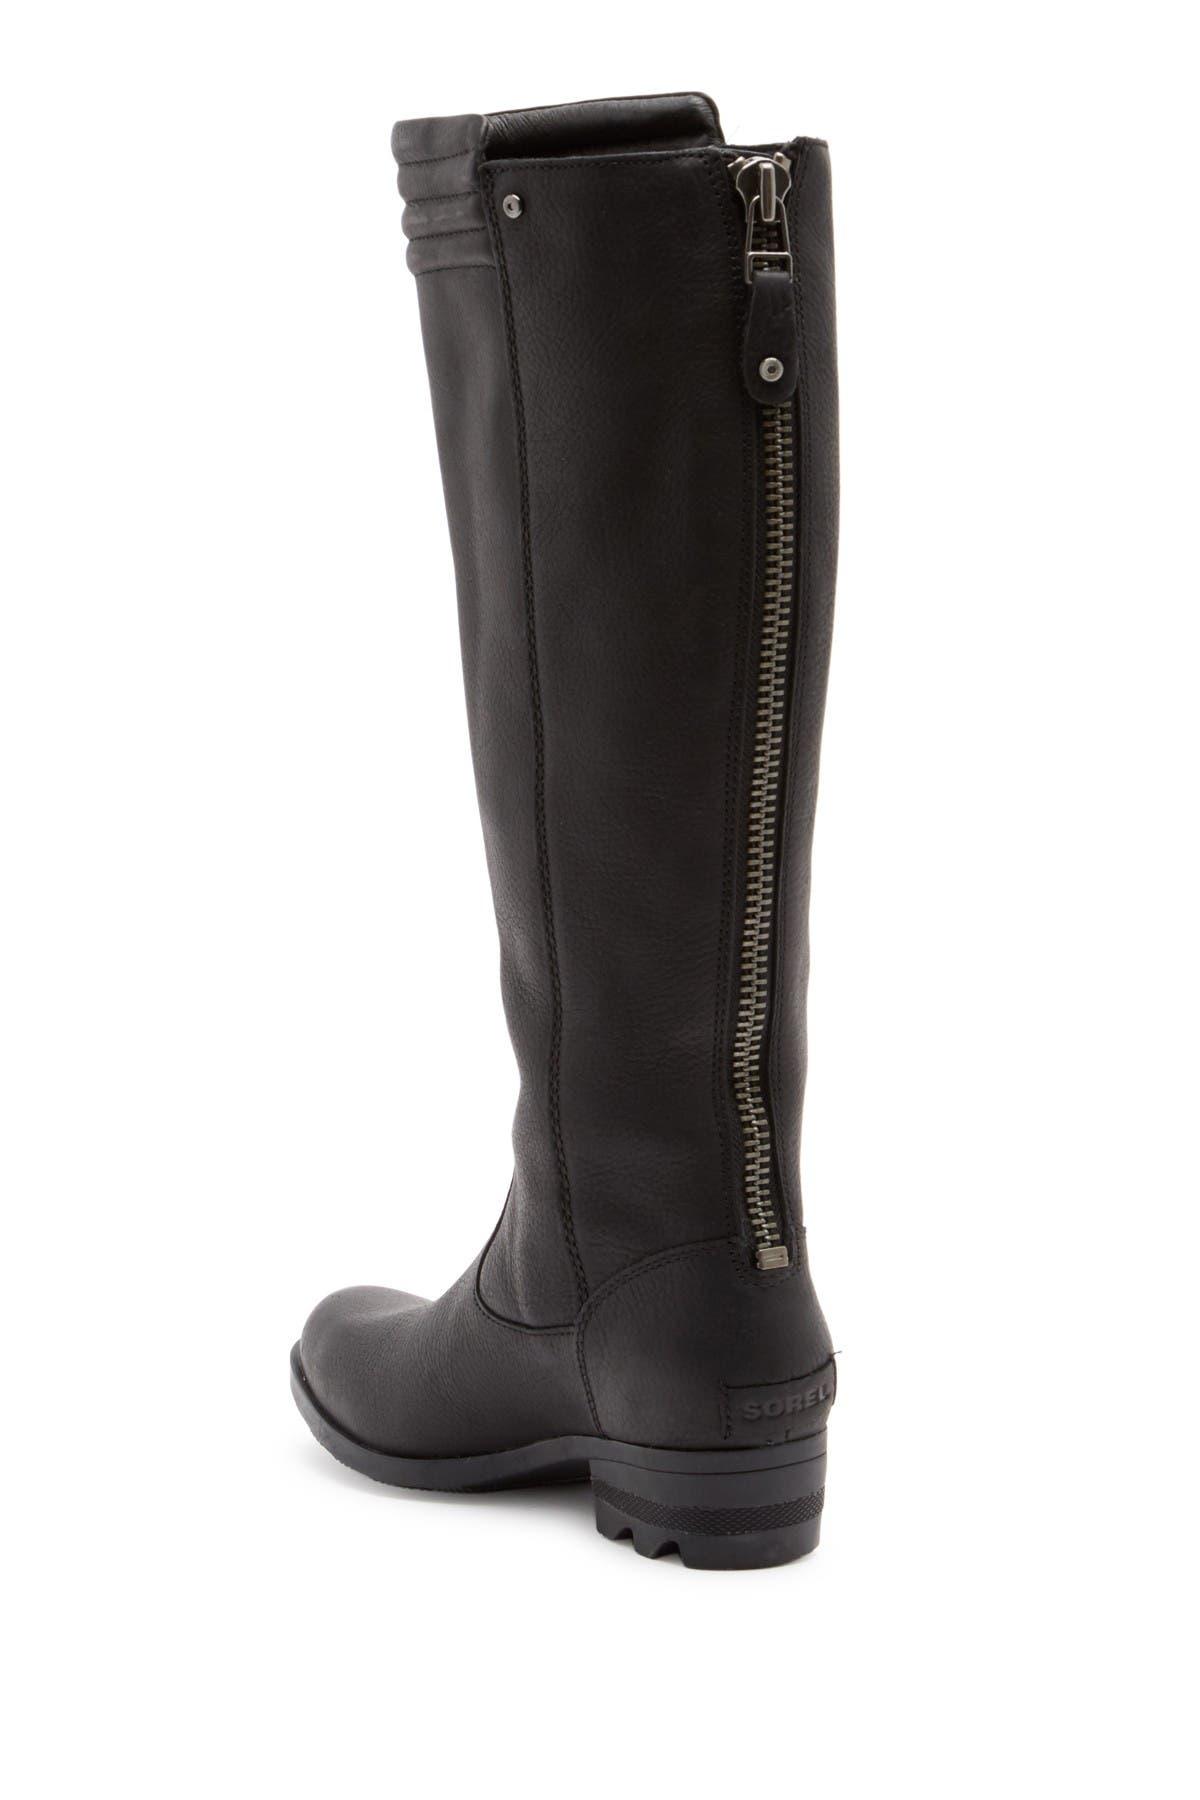 Sorel | Danica Tall Waterproof Leather